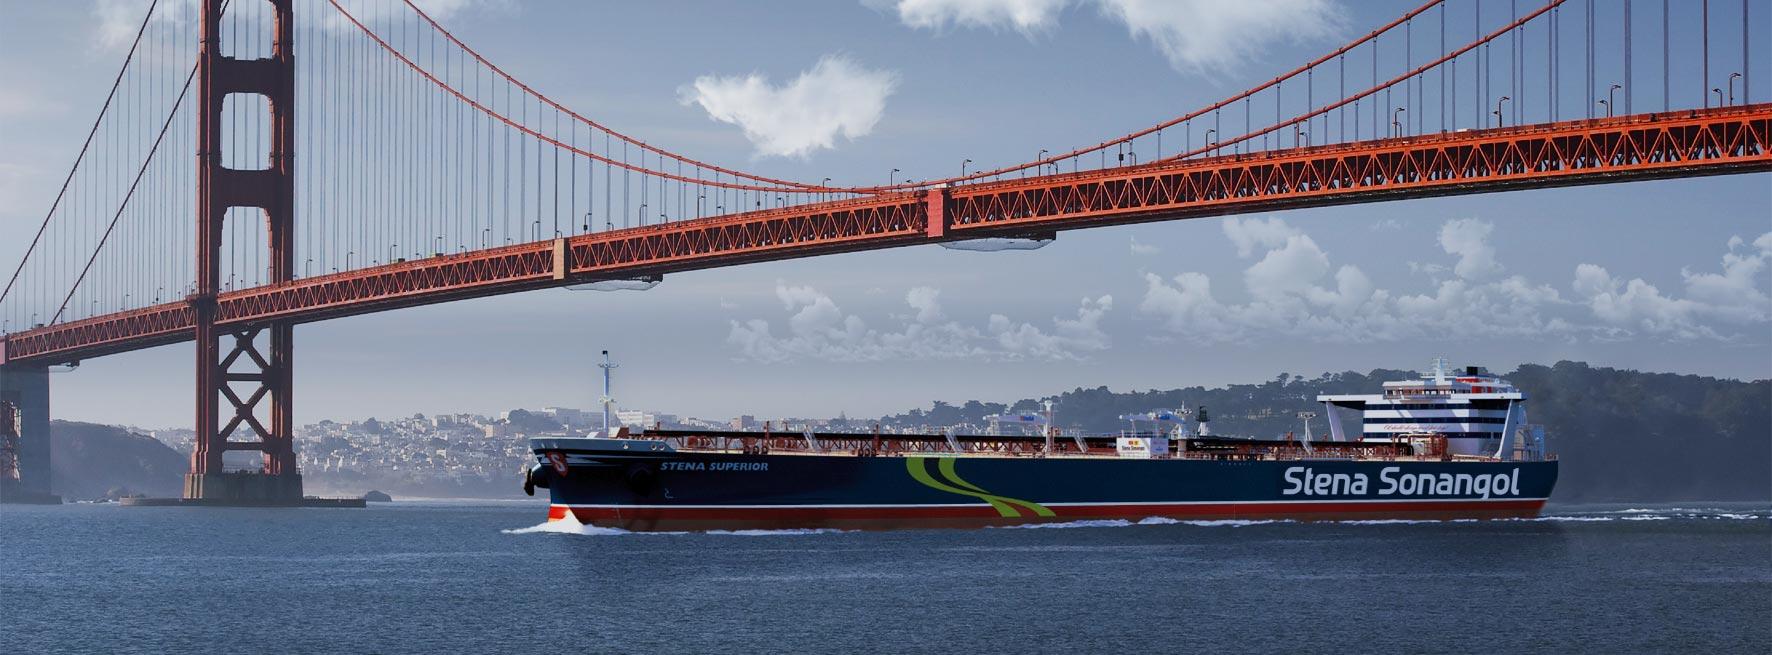 Our Vessels | Stena Sonangol Suezmax Pool